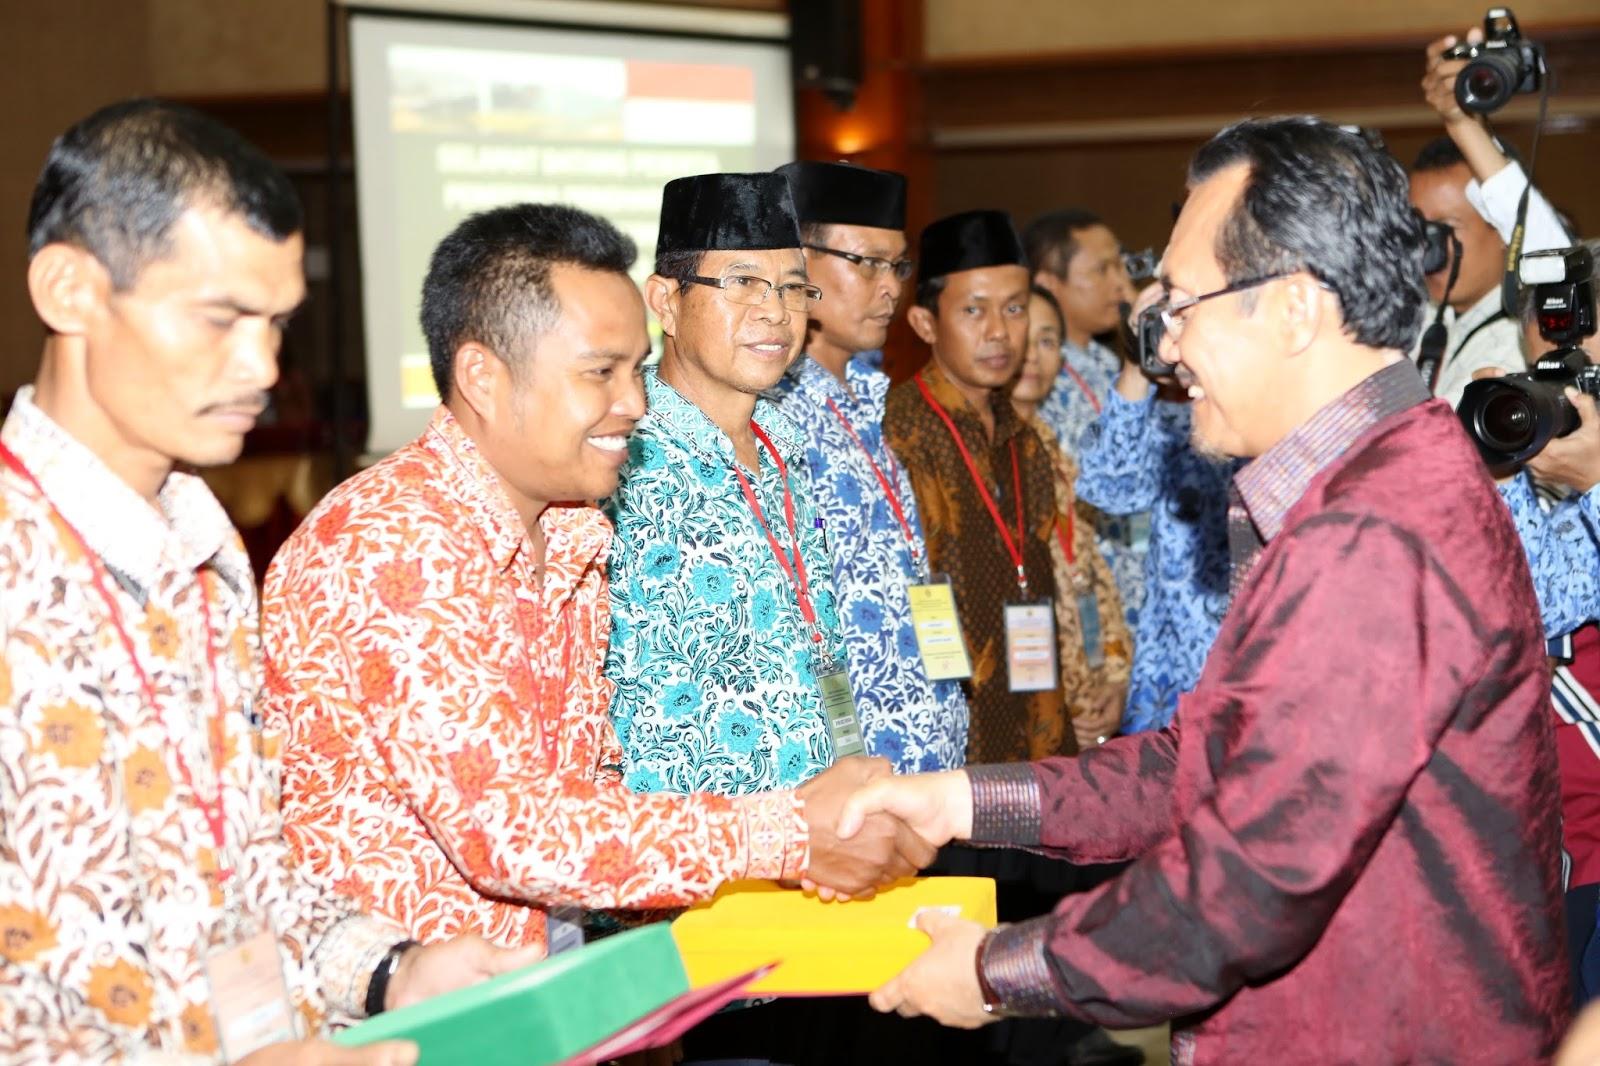 Petani Indonesia Berprestasi Petani Berprestasi